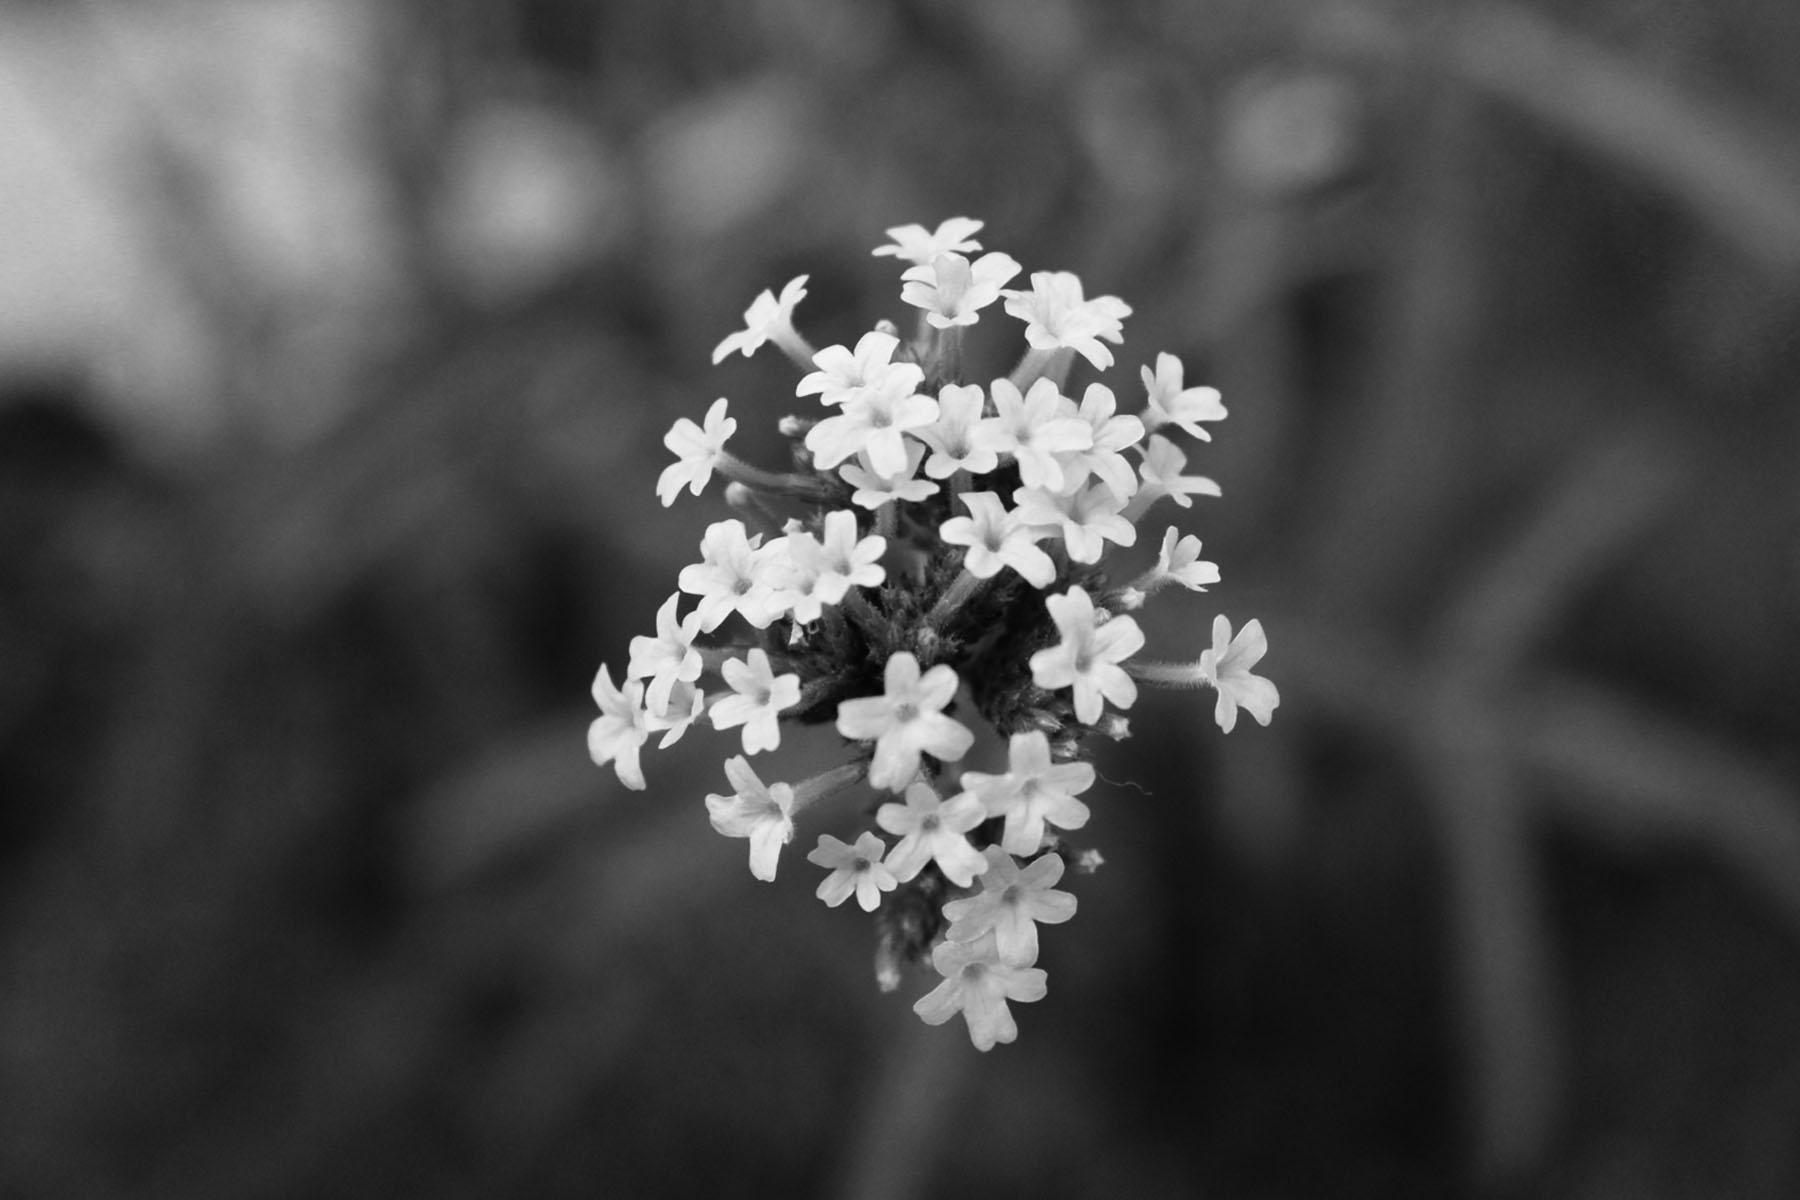 Flower Photography Tumblr Black And White | www.pixshark ...